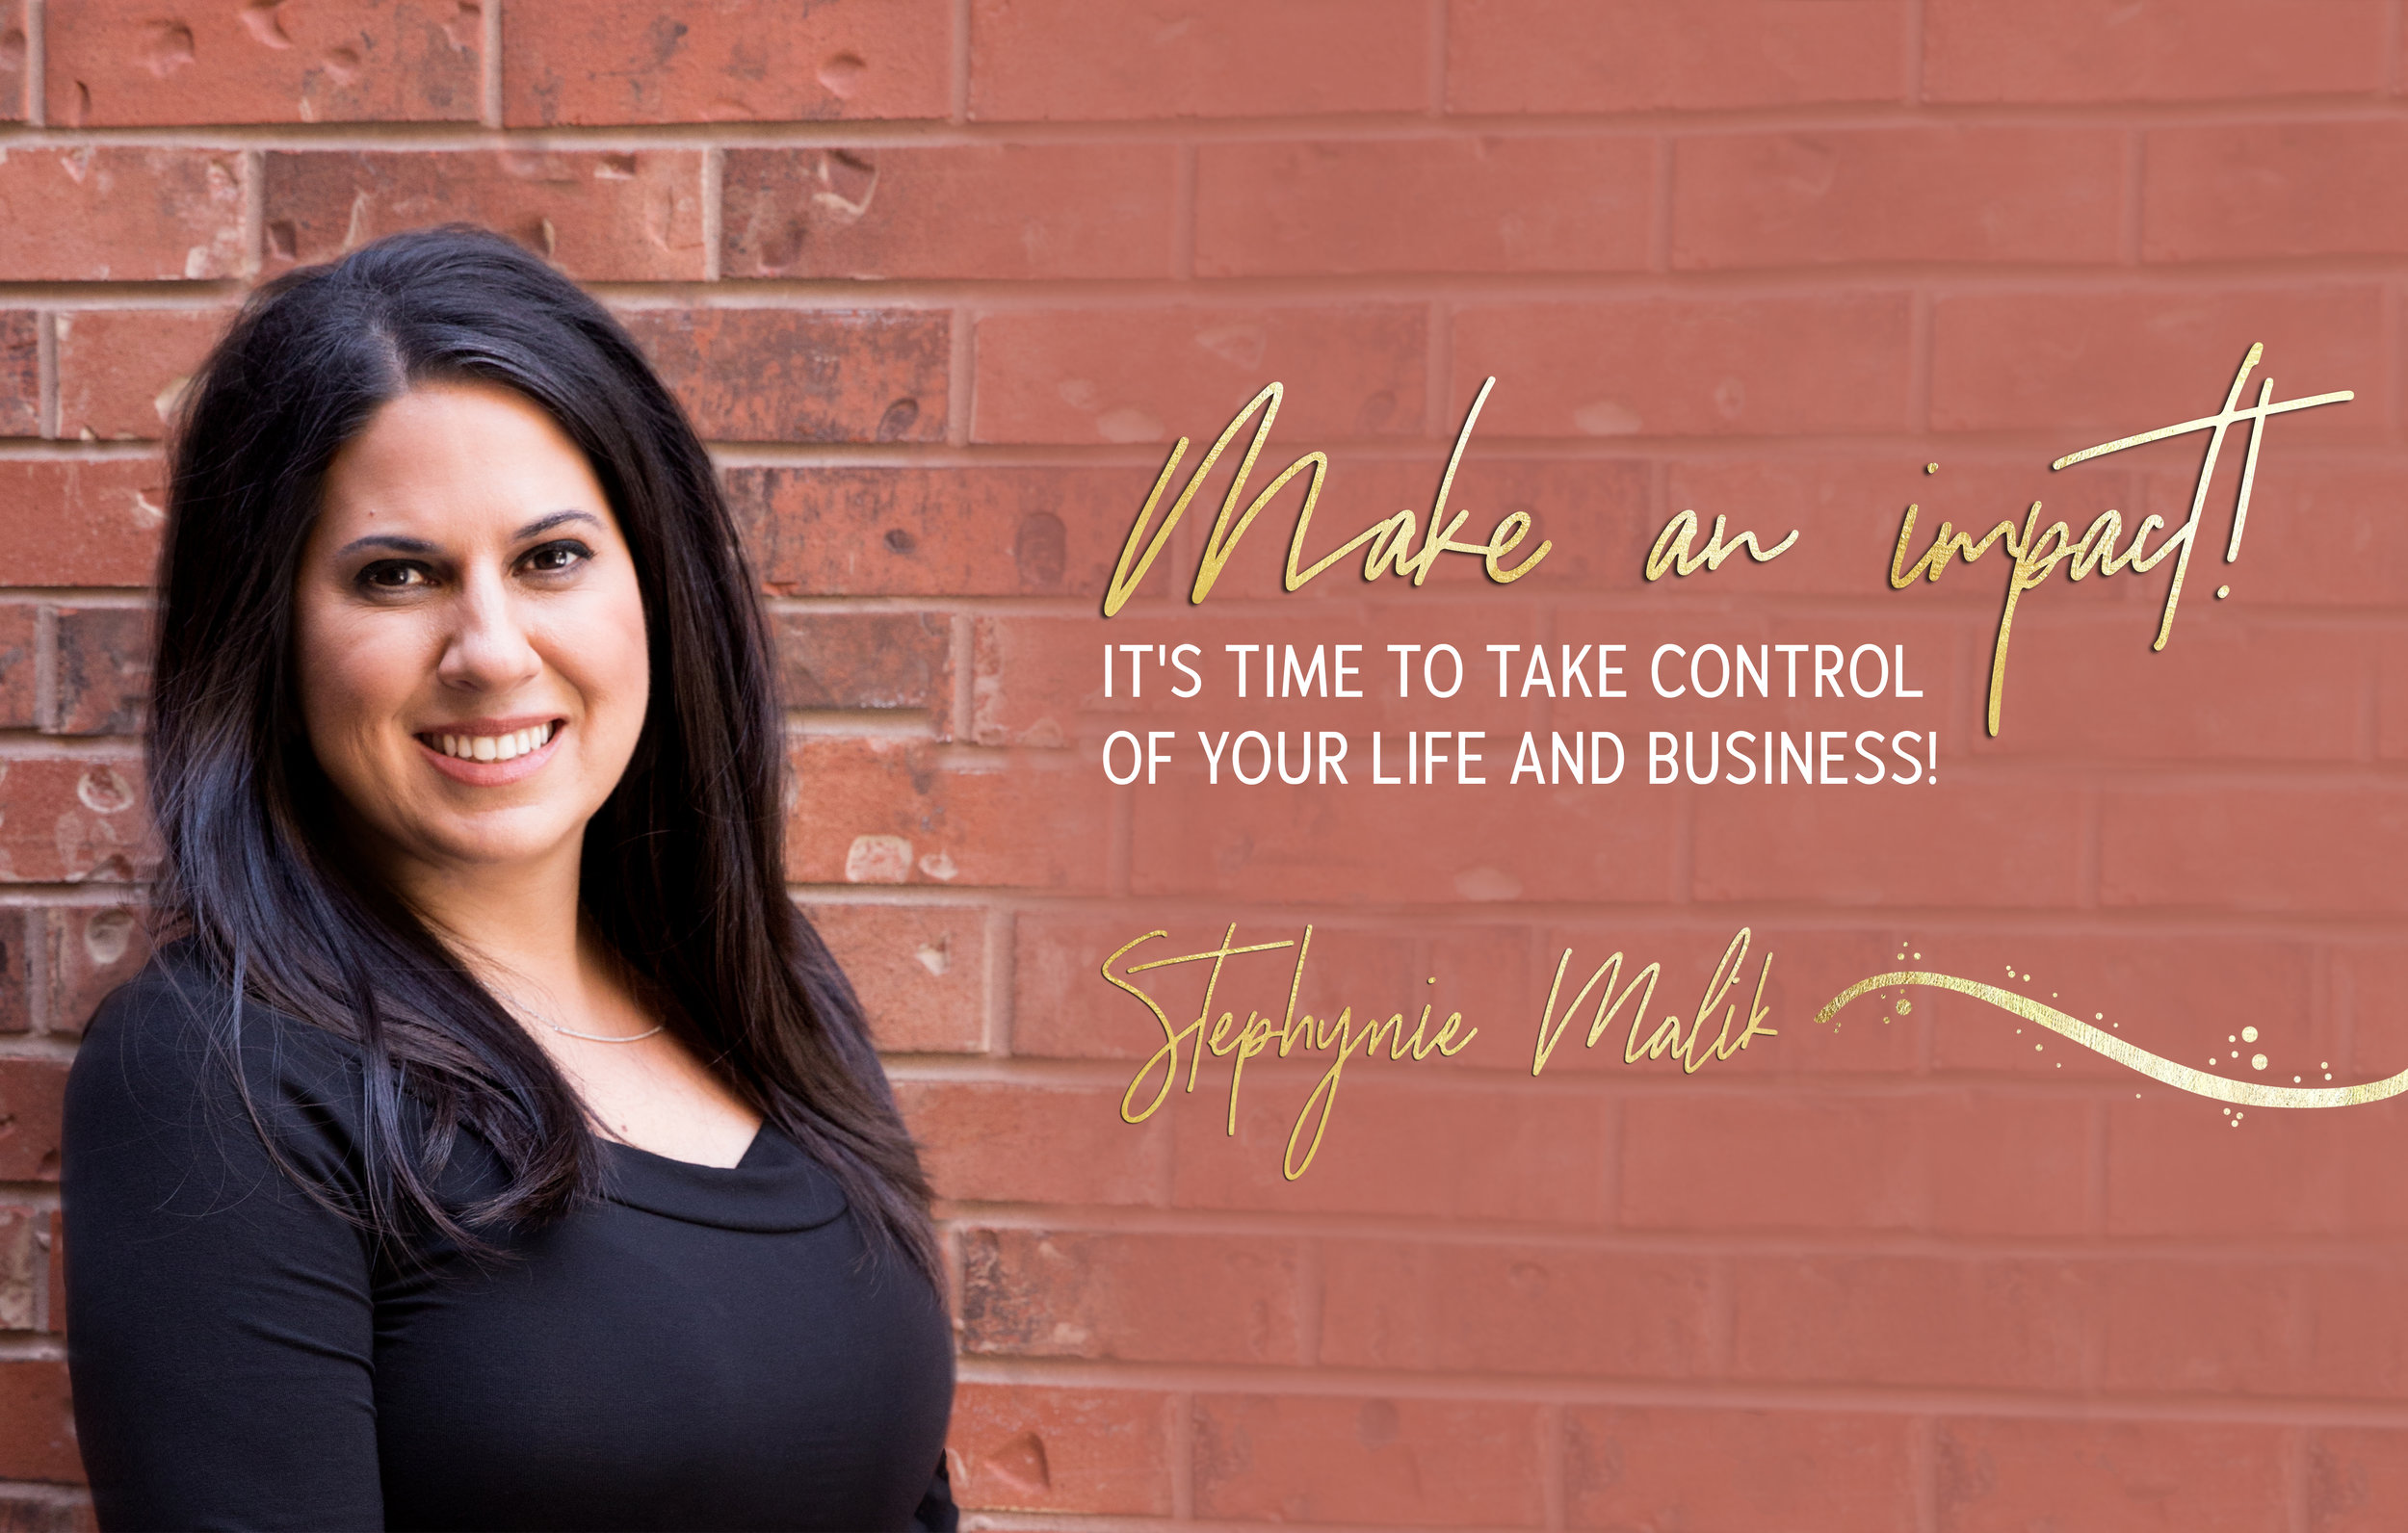 Stephynie Malik, CEO & Founder of ChiqueSpeak